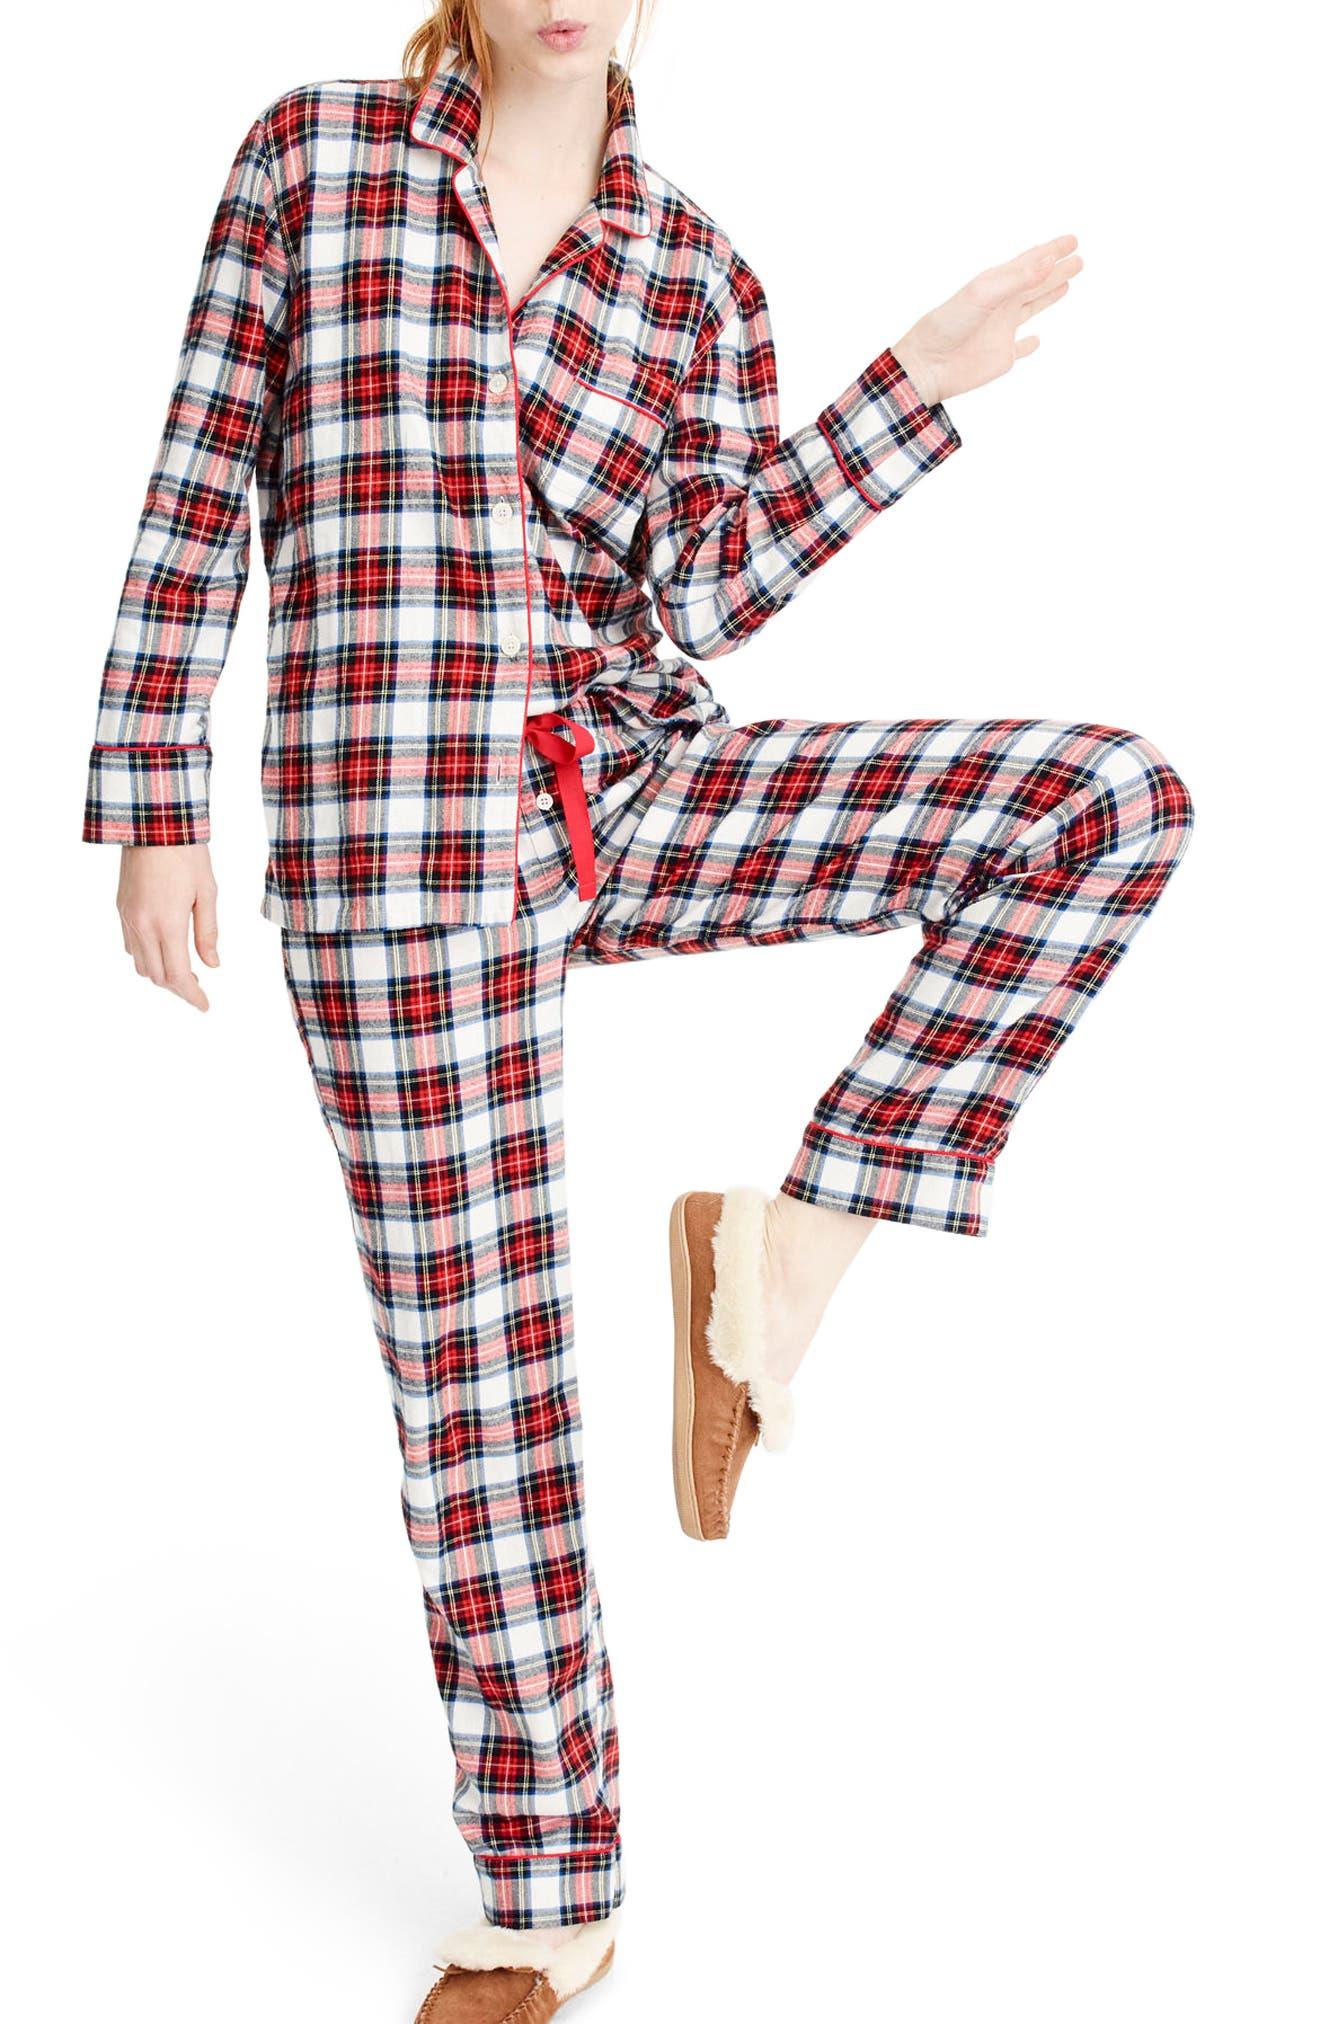 Whiteout Plaid Flannel Pajamas,                             Main thumbnail 1, color,                             601